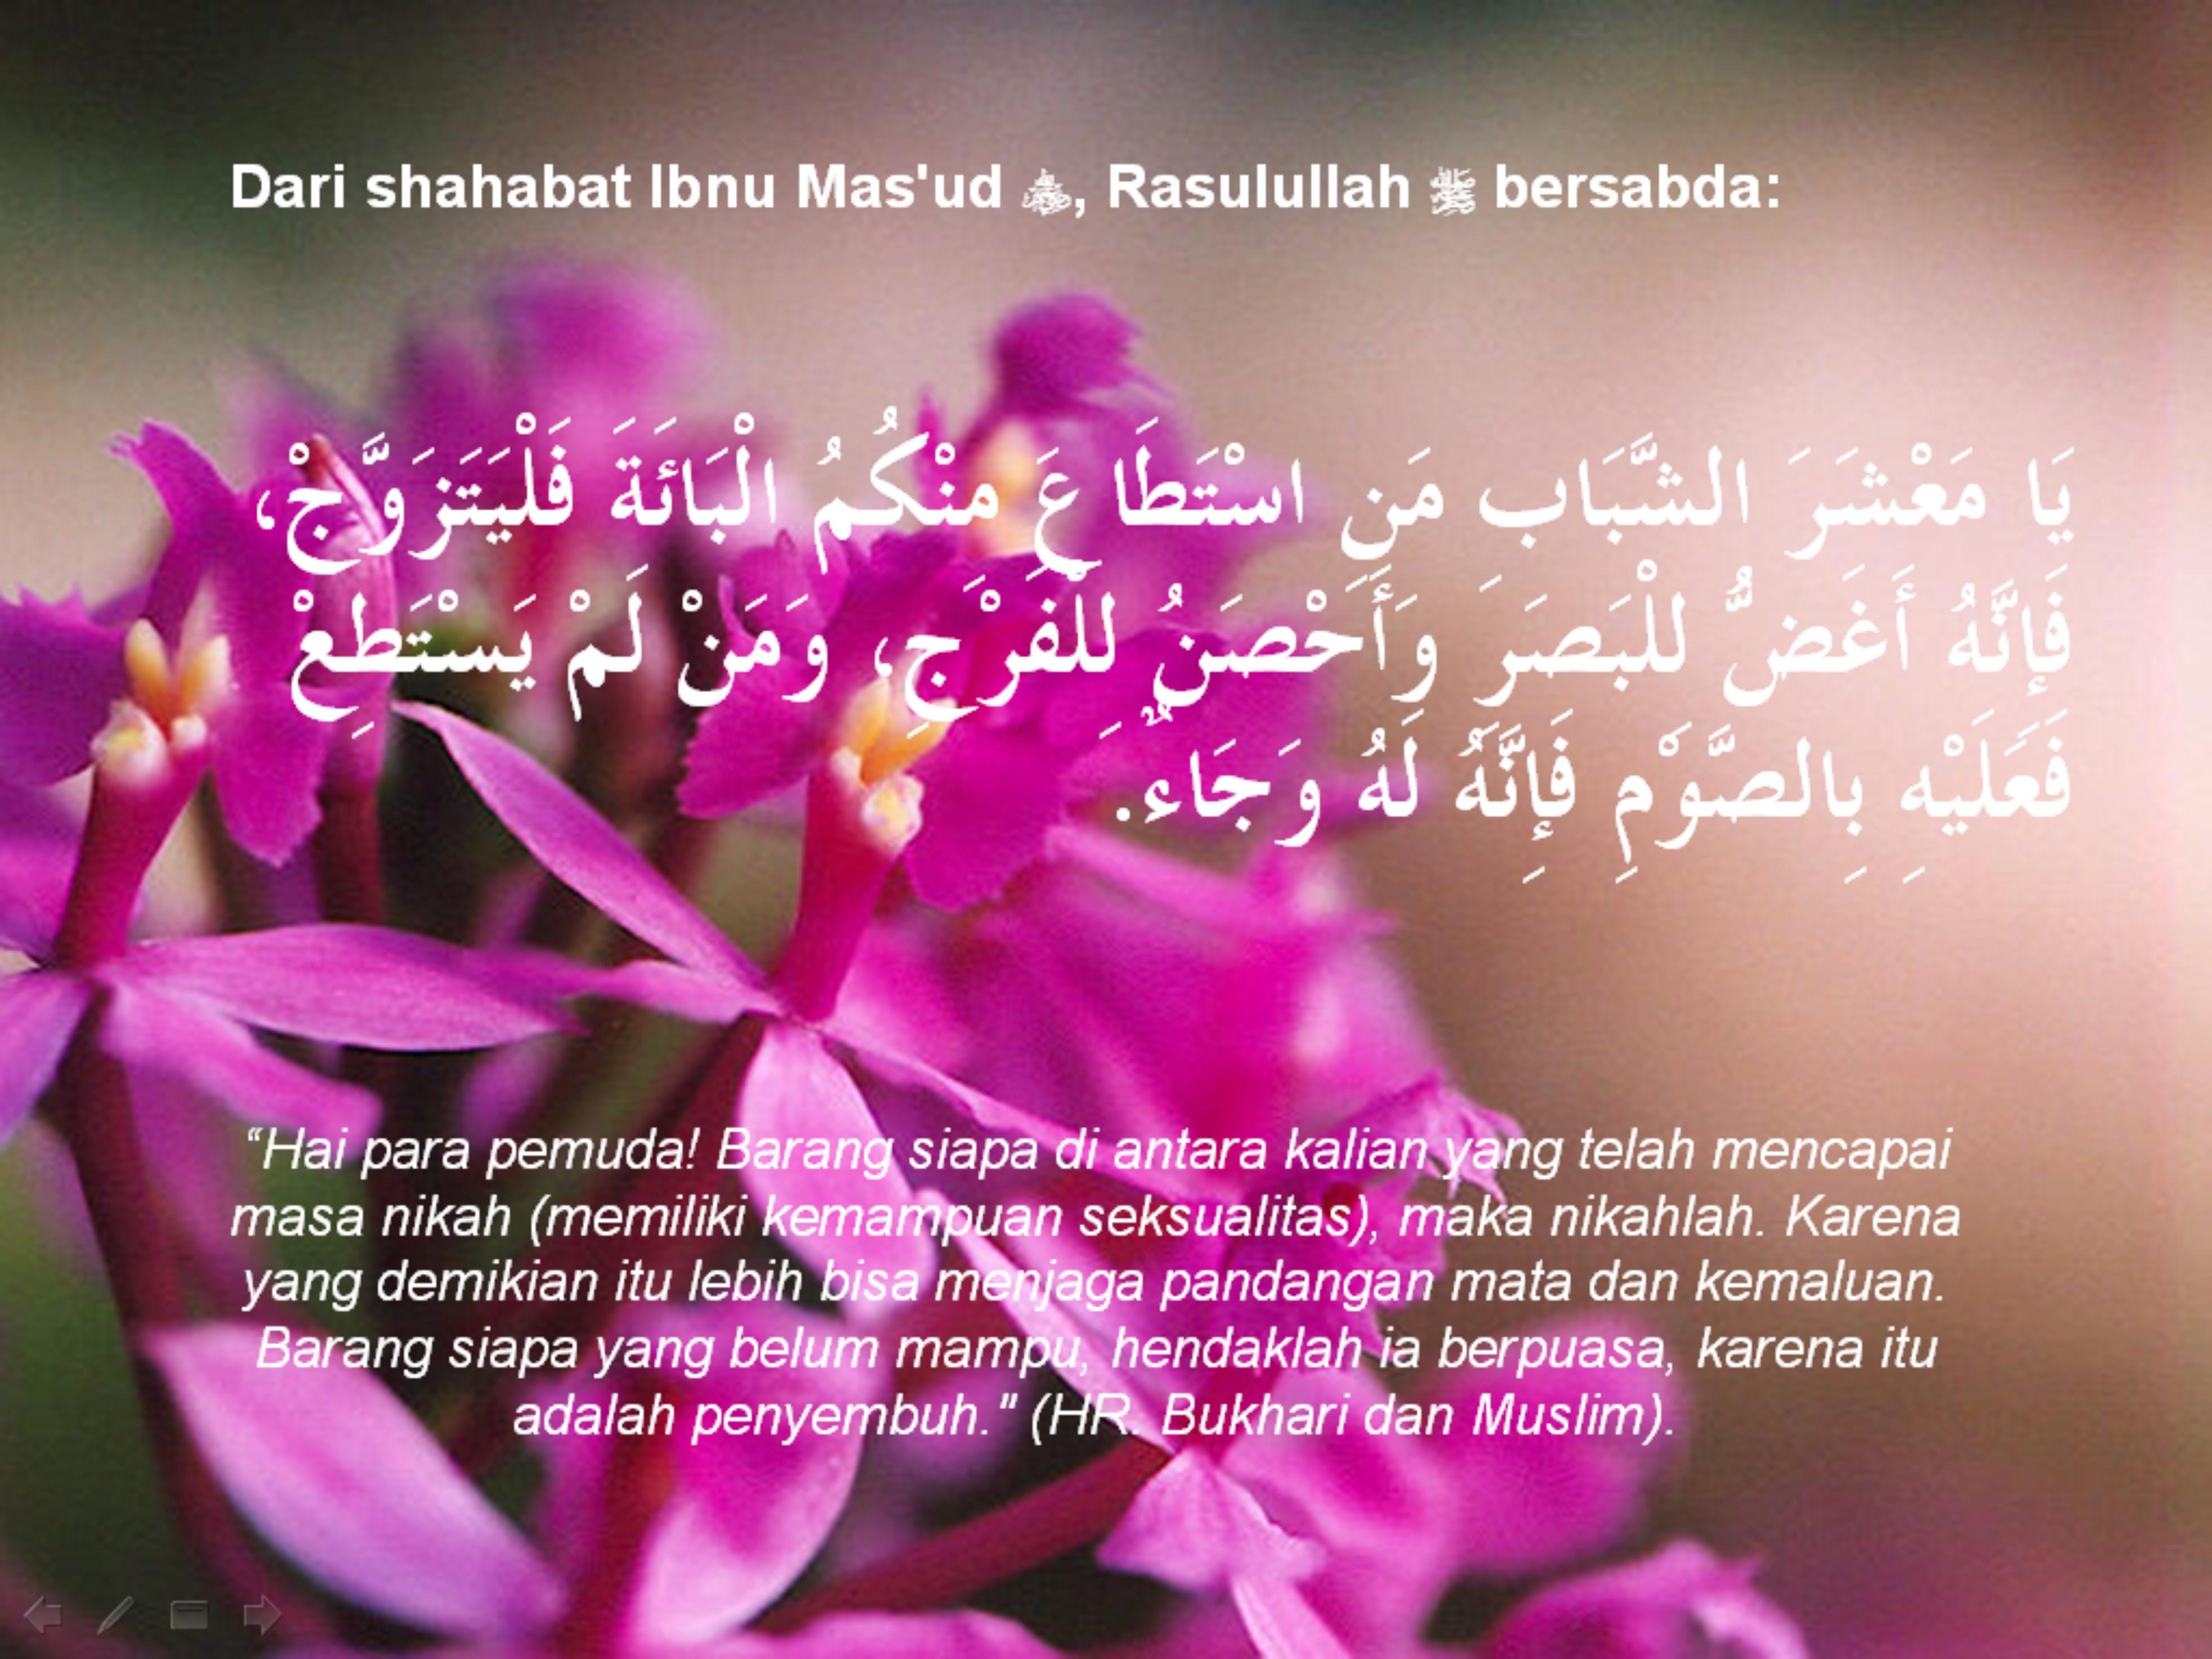 Kata Mutiara Ulang Tahun Pernikahan Islami